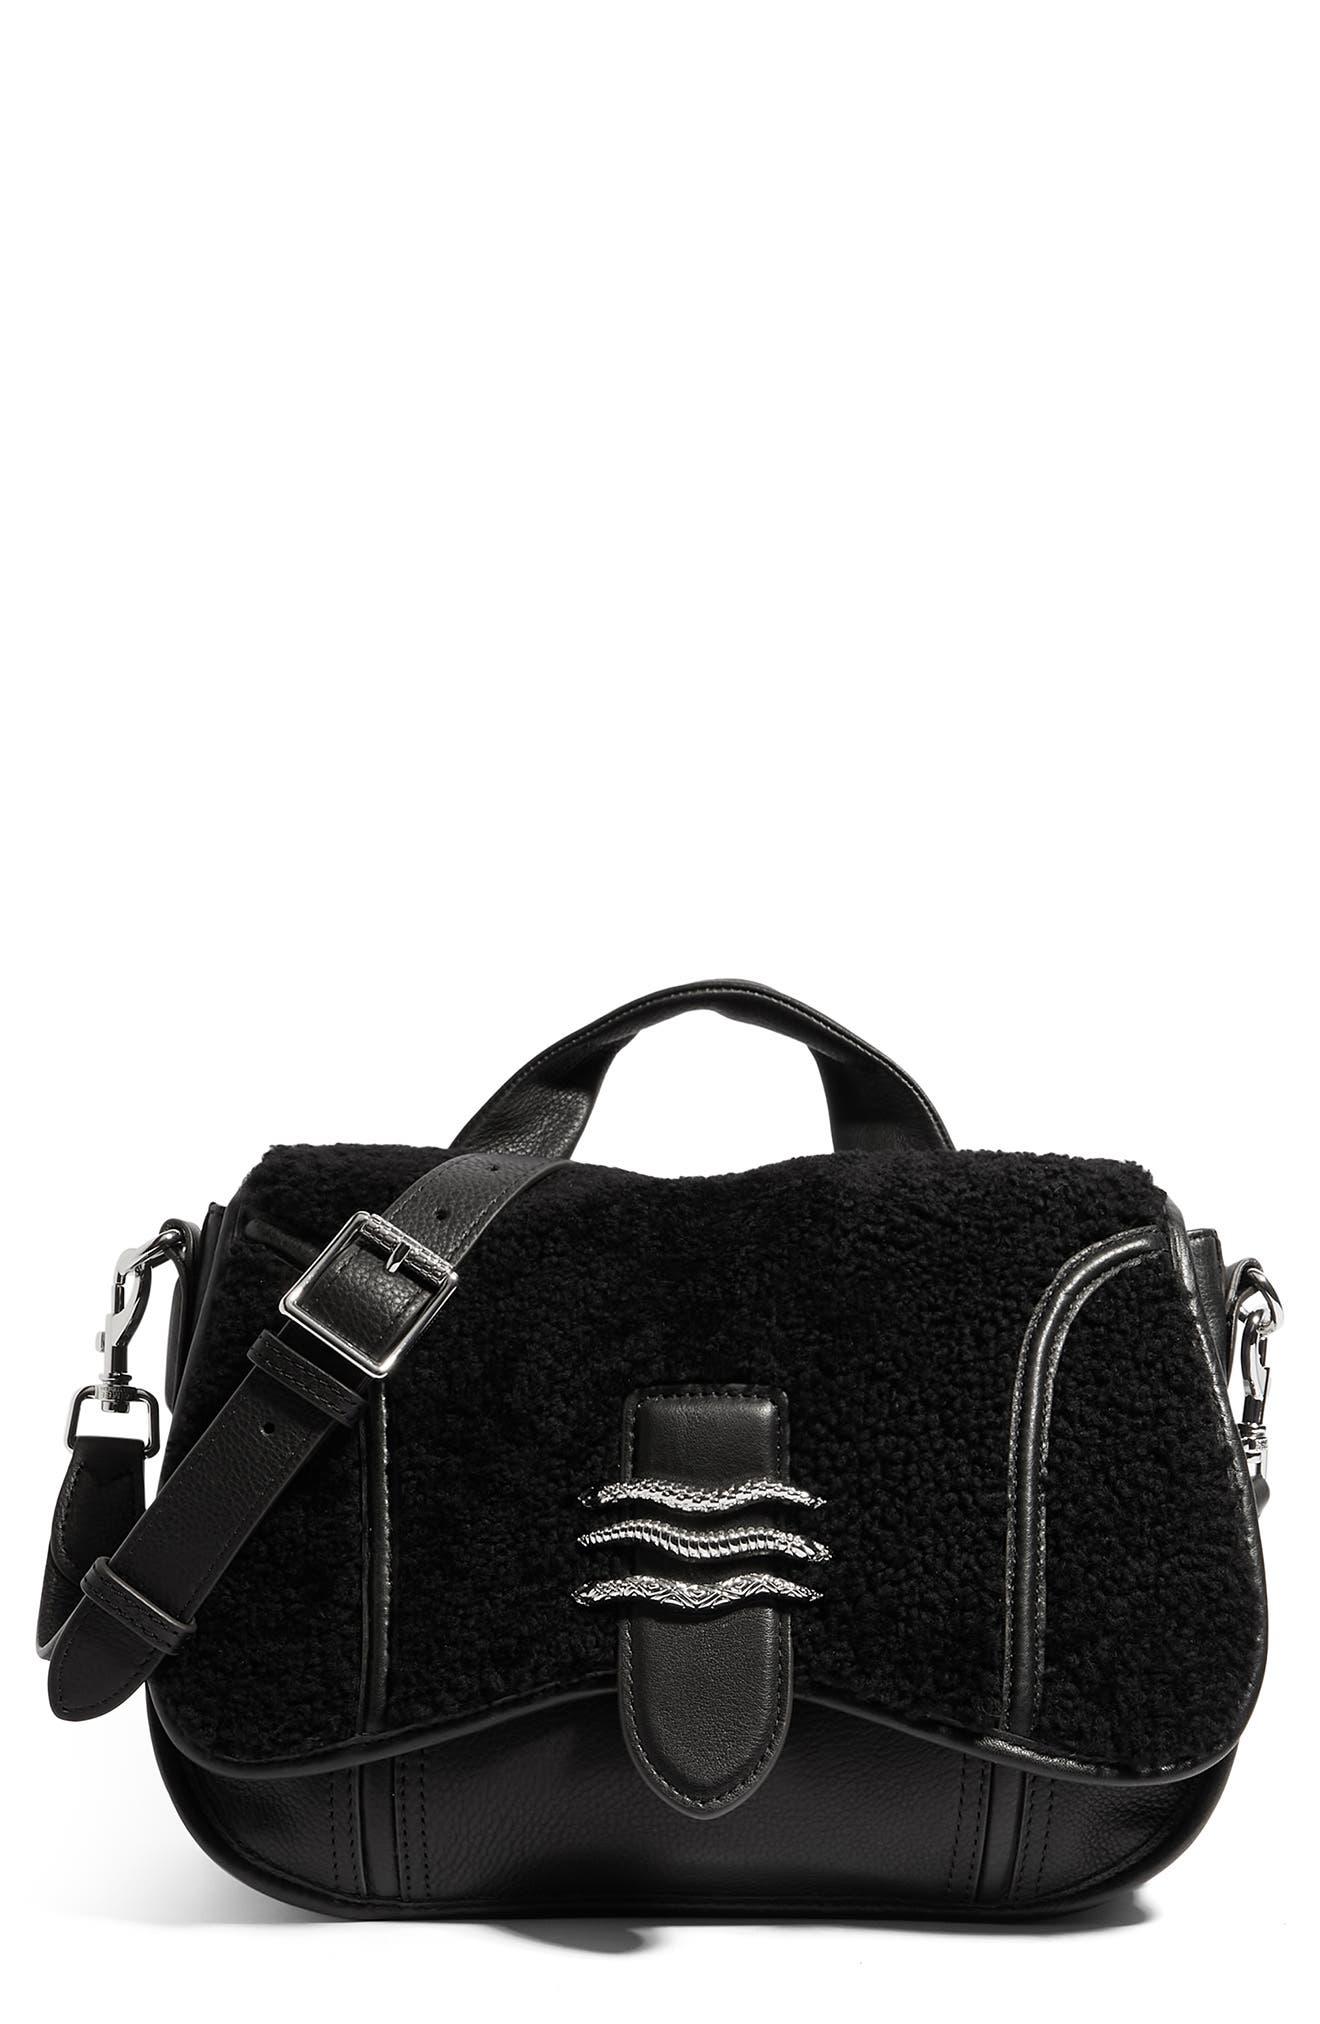 Fierce & Fab Saddle Bag